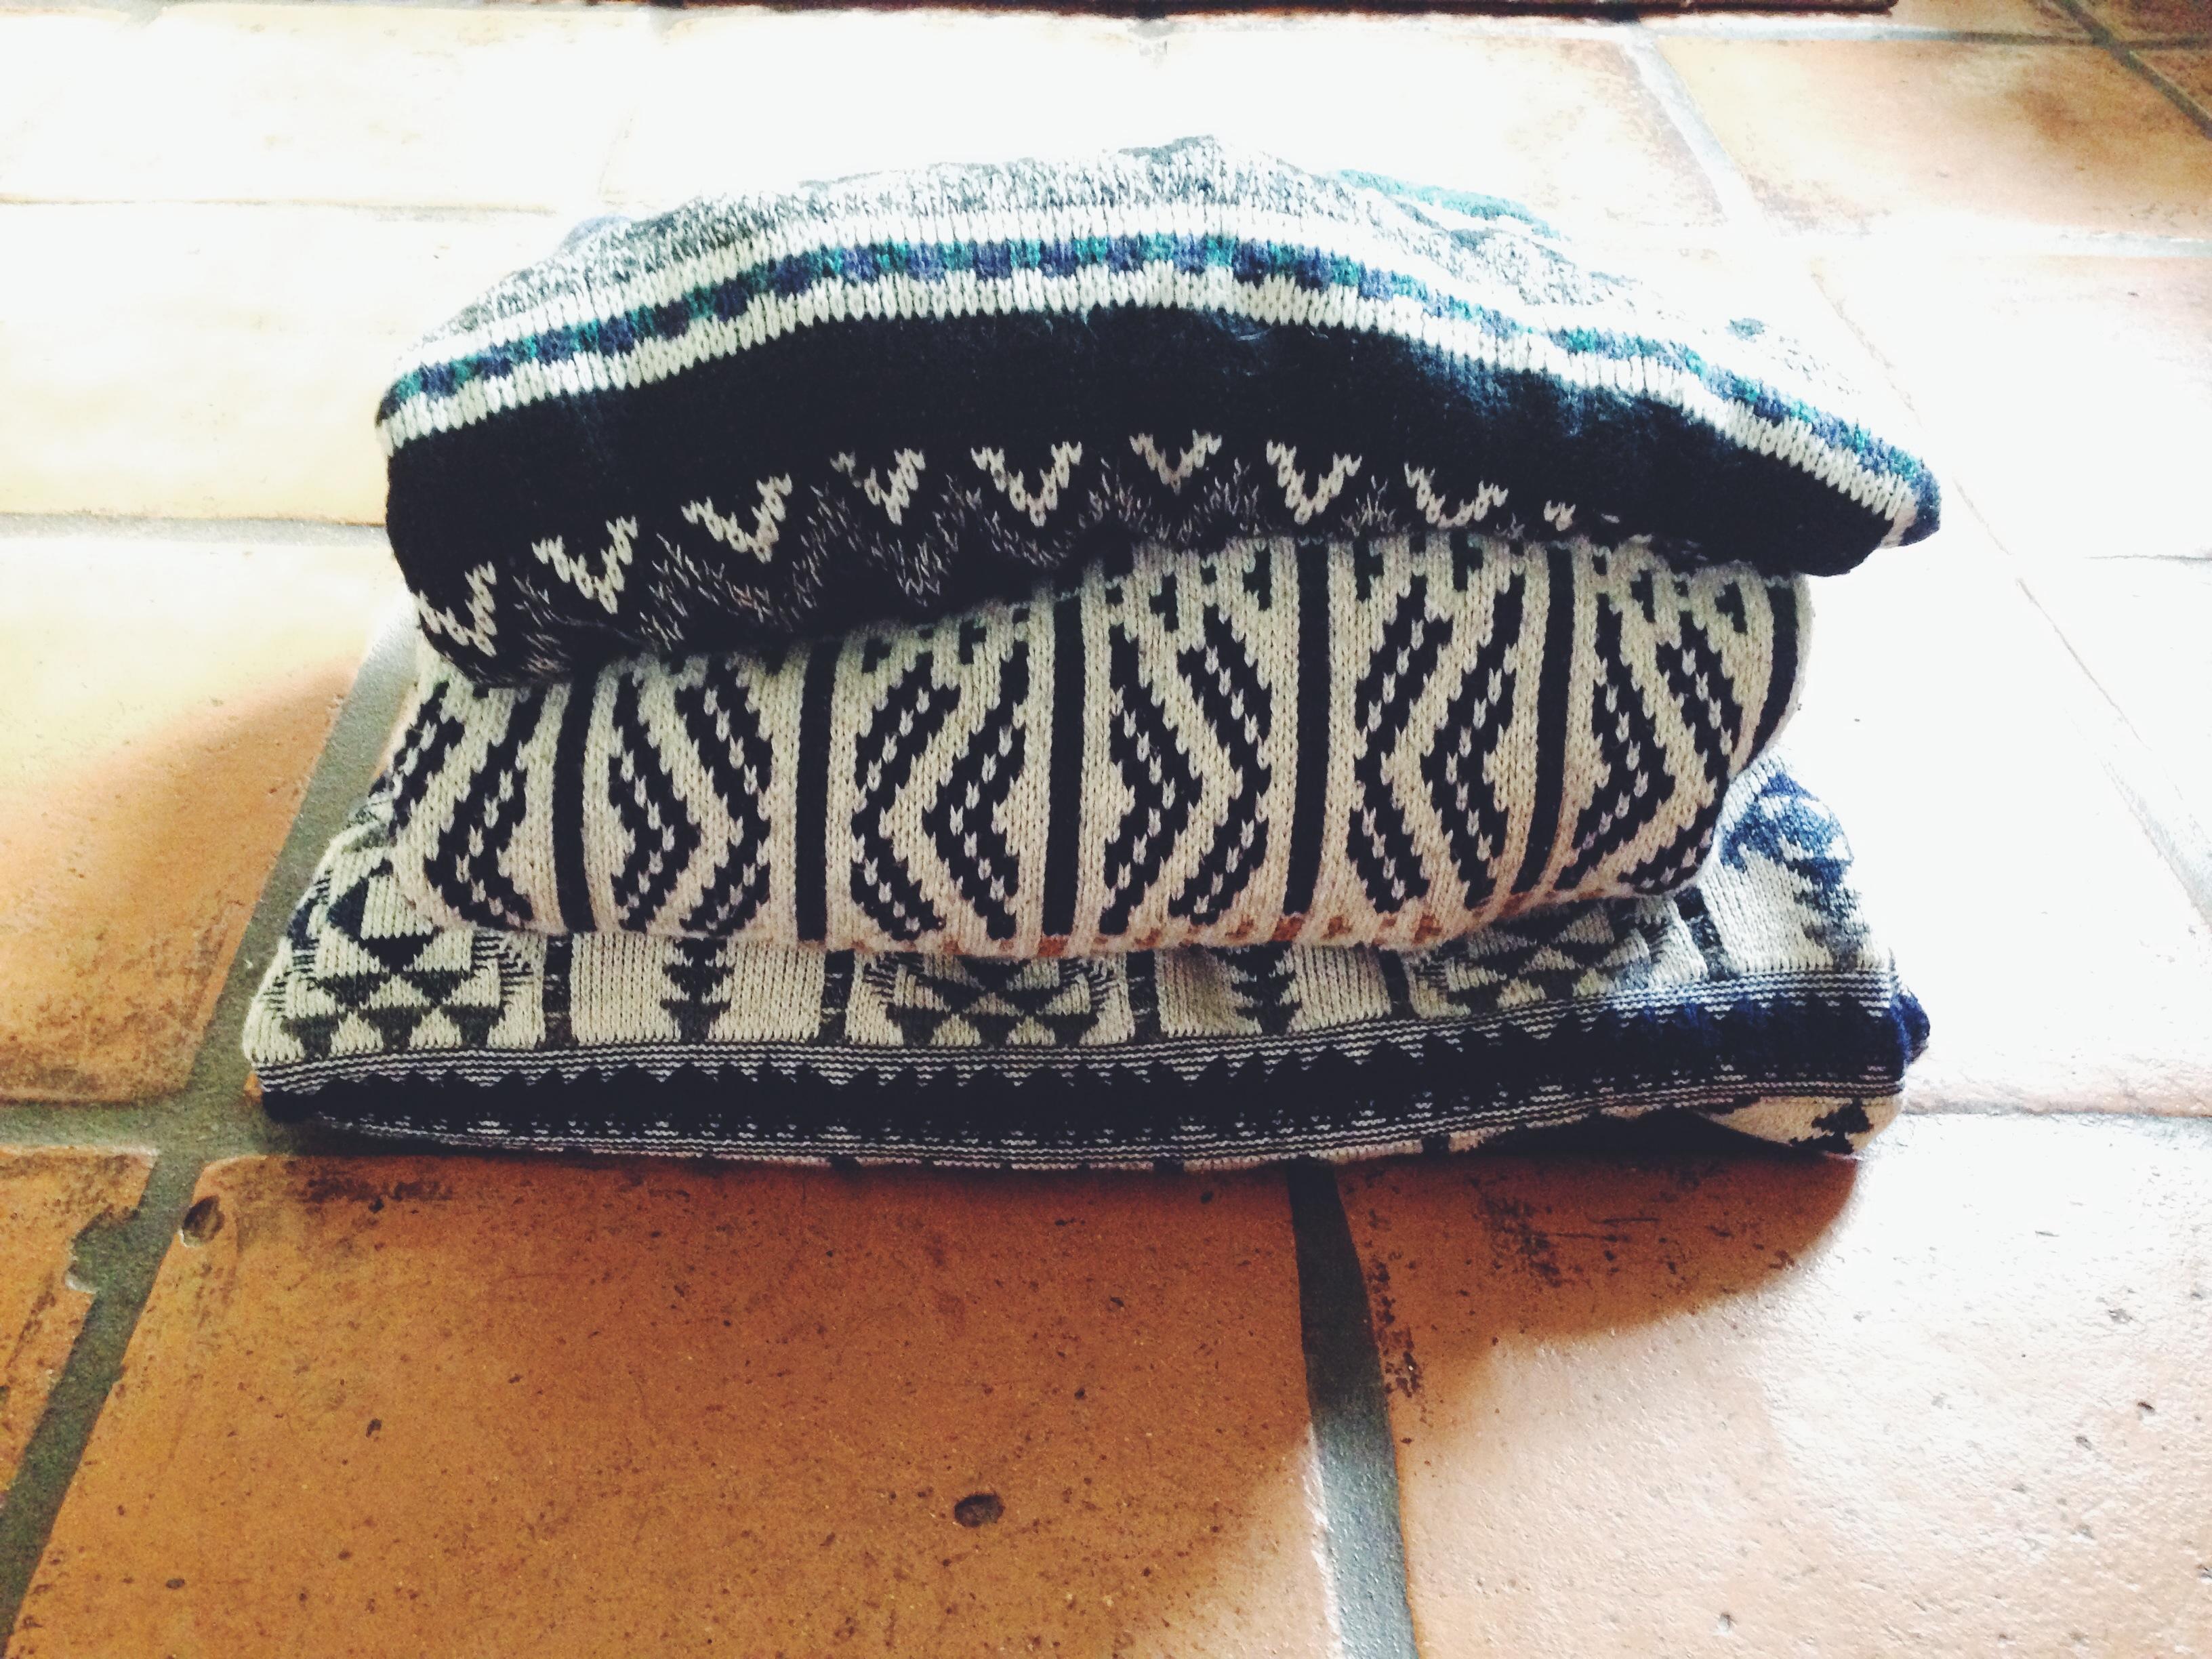 Random Vintage Tribal Sweater from Knee Deep Denim on Storenvy